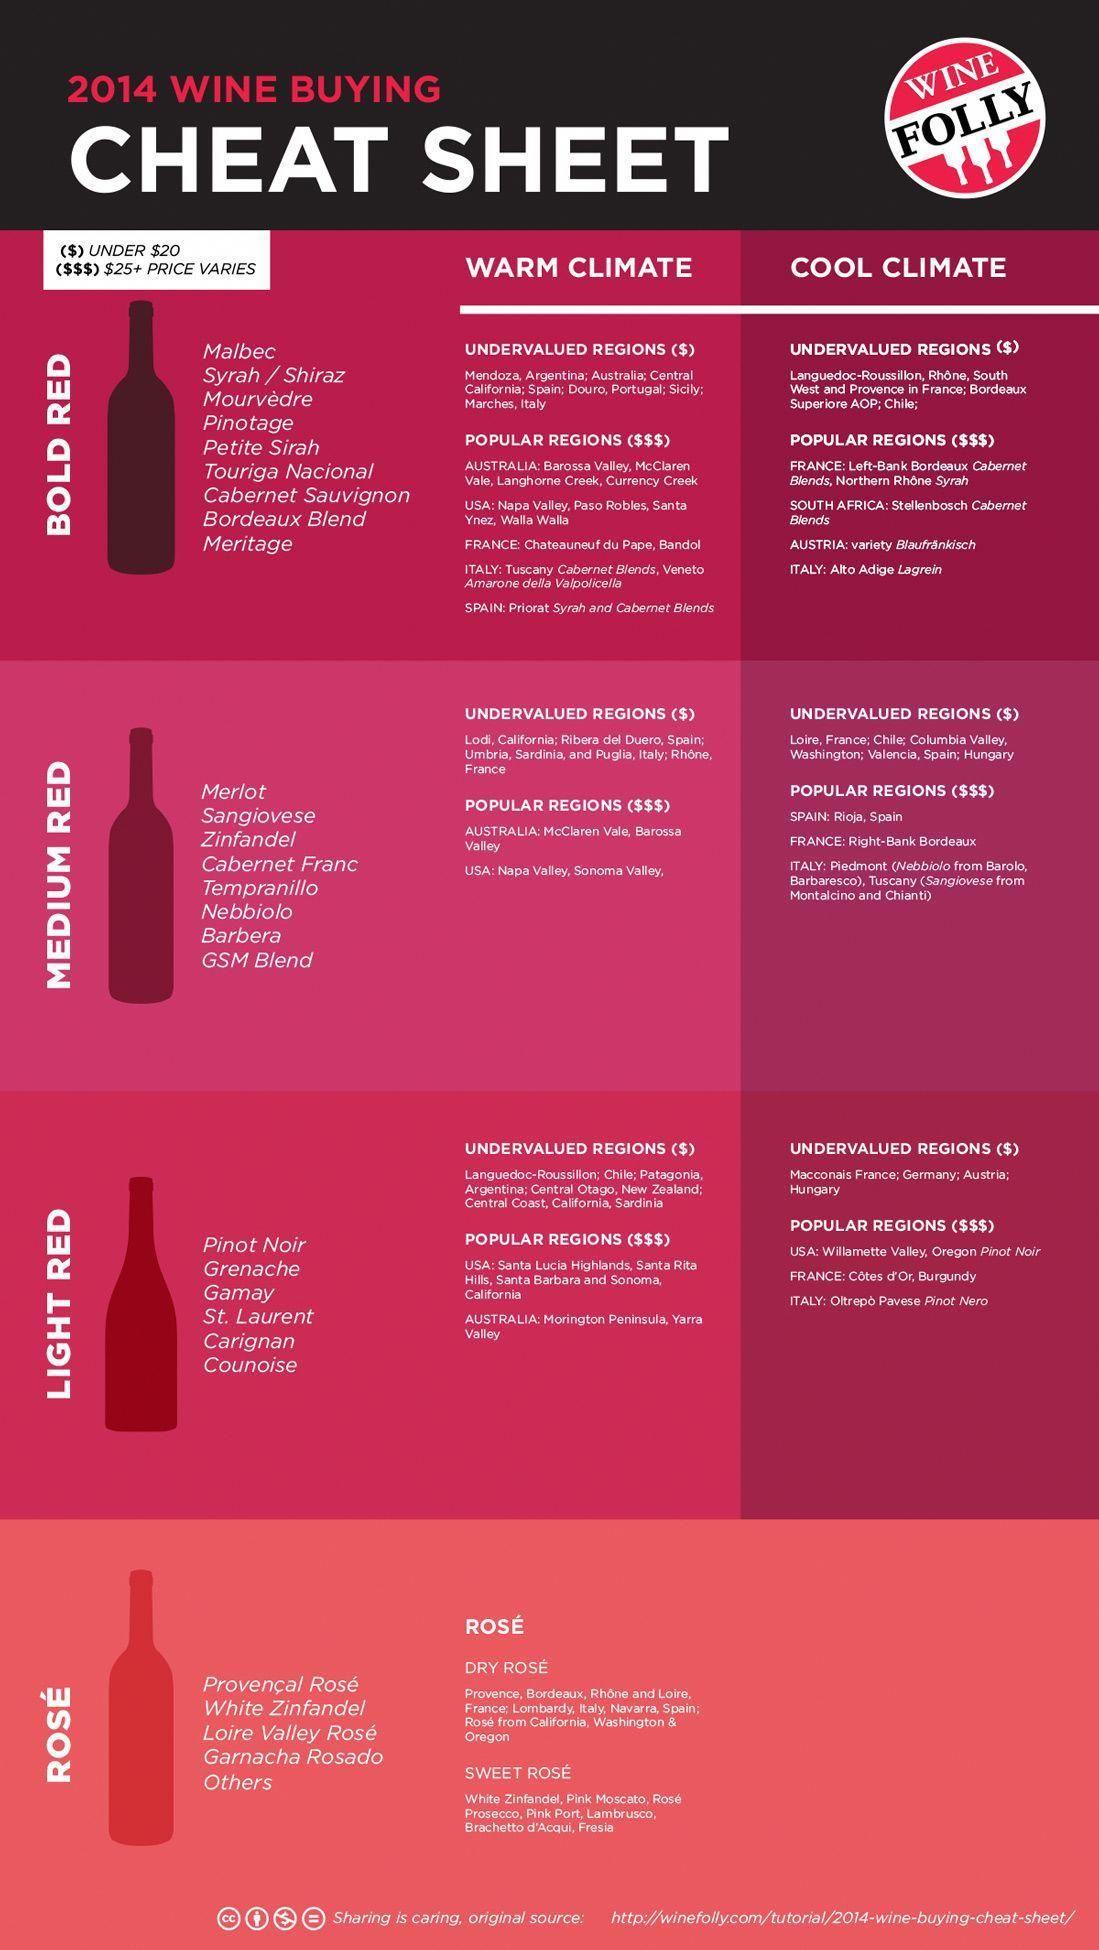 Marvelous Red 2011 A Blend Of 83 Shiraz 9 Grenache 3 Viognier 5 Mourvedre Grenache Viognier Wine Bottle